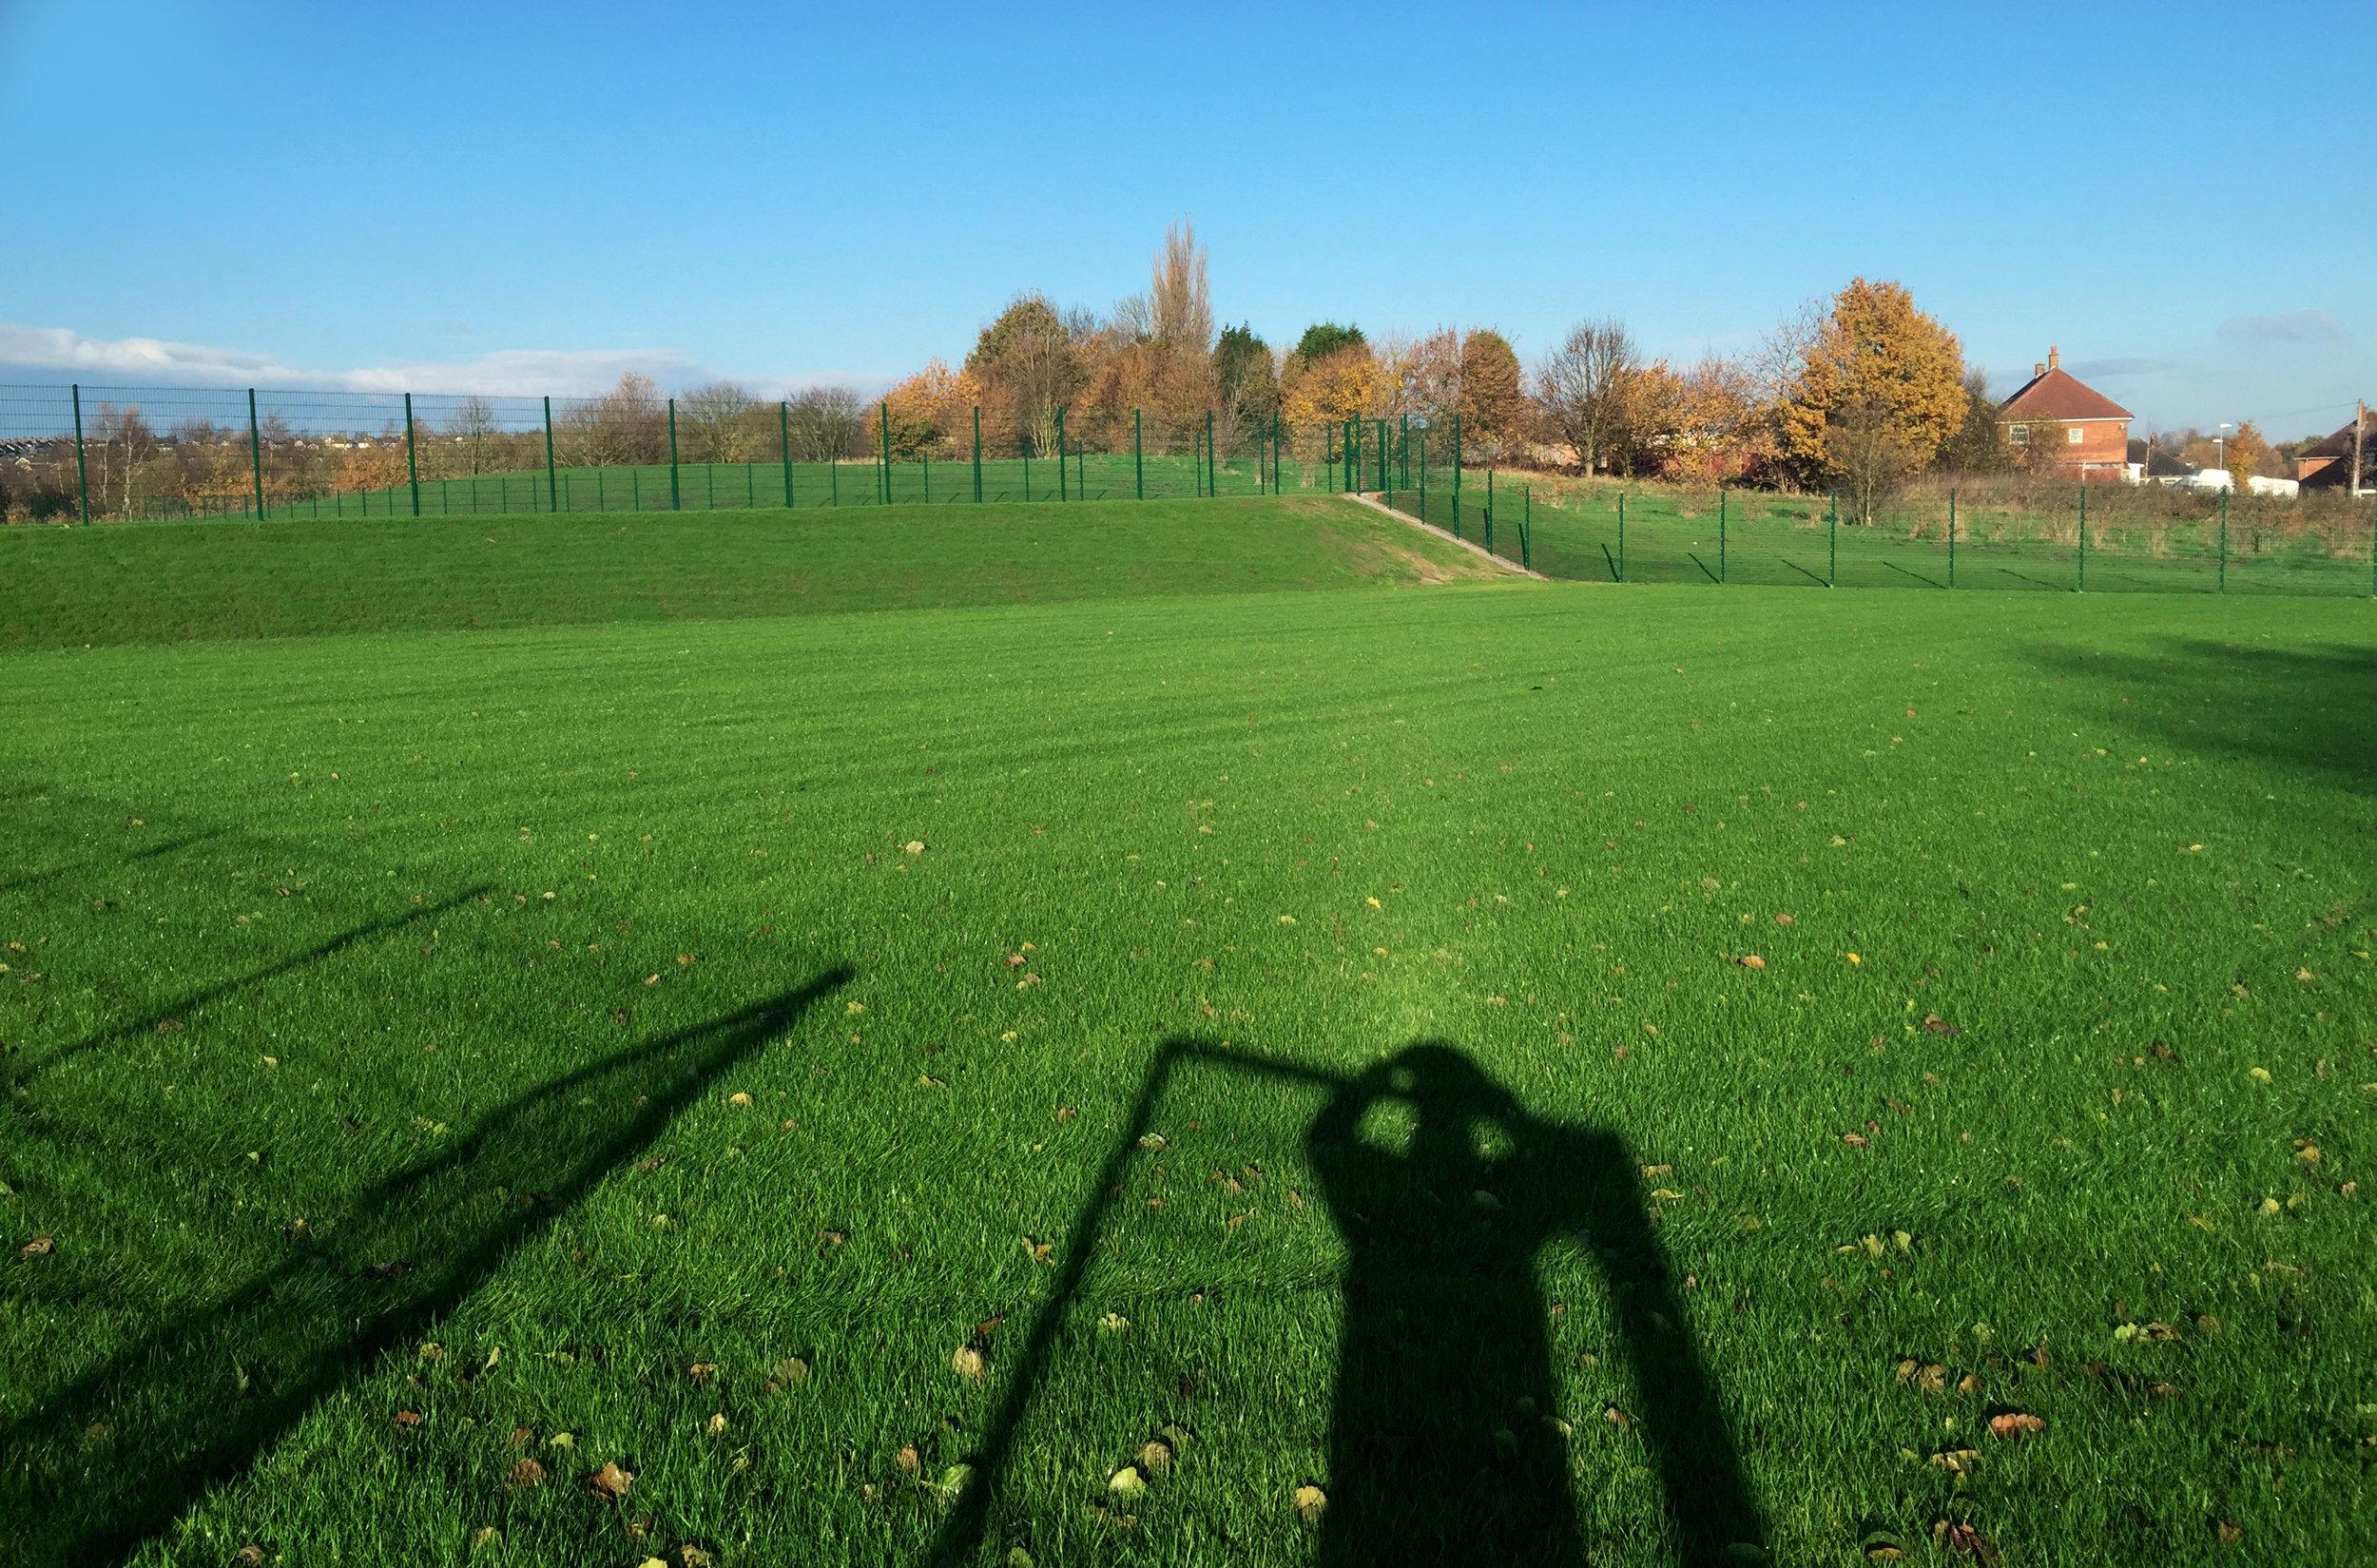 Mini-soccer pitch after first cut (December 2014).